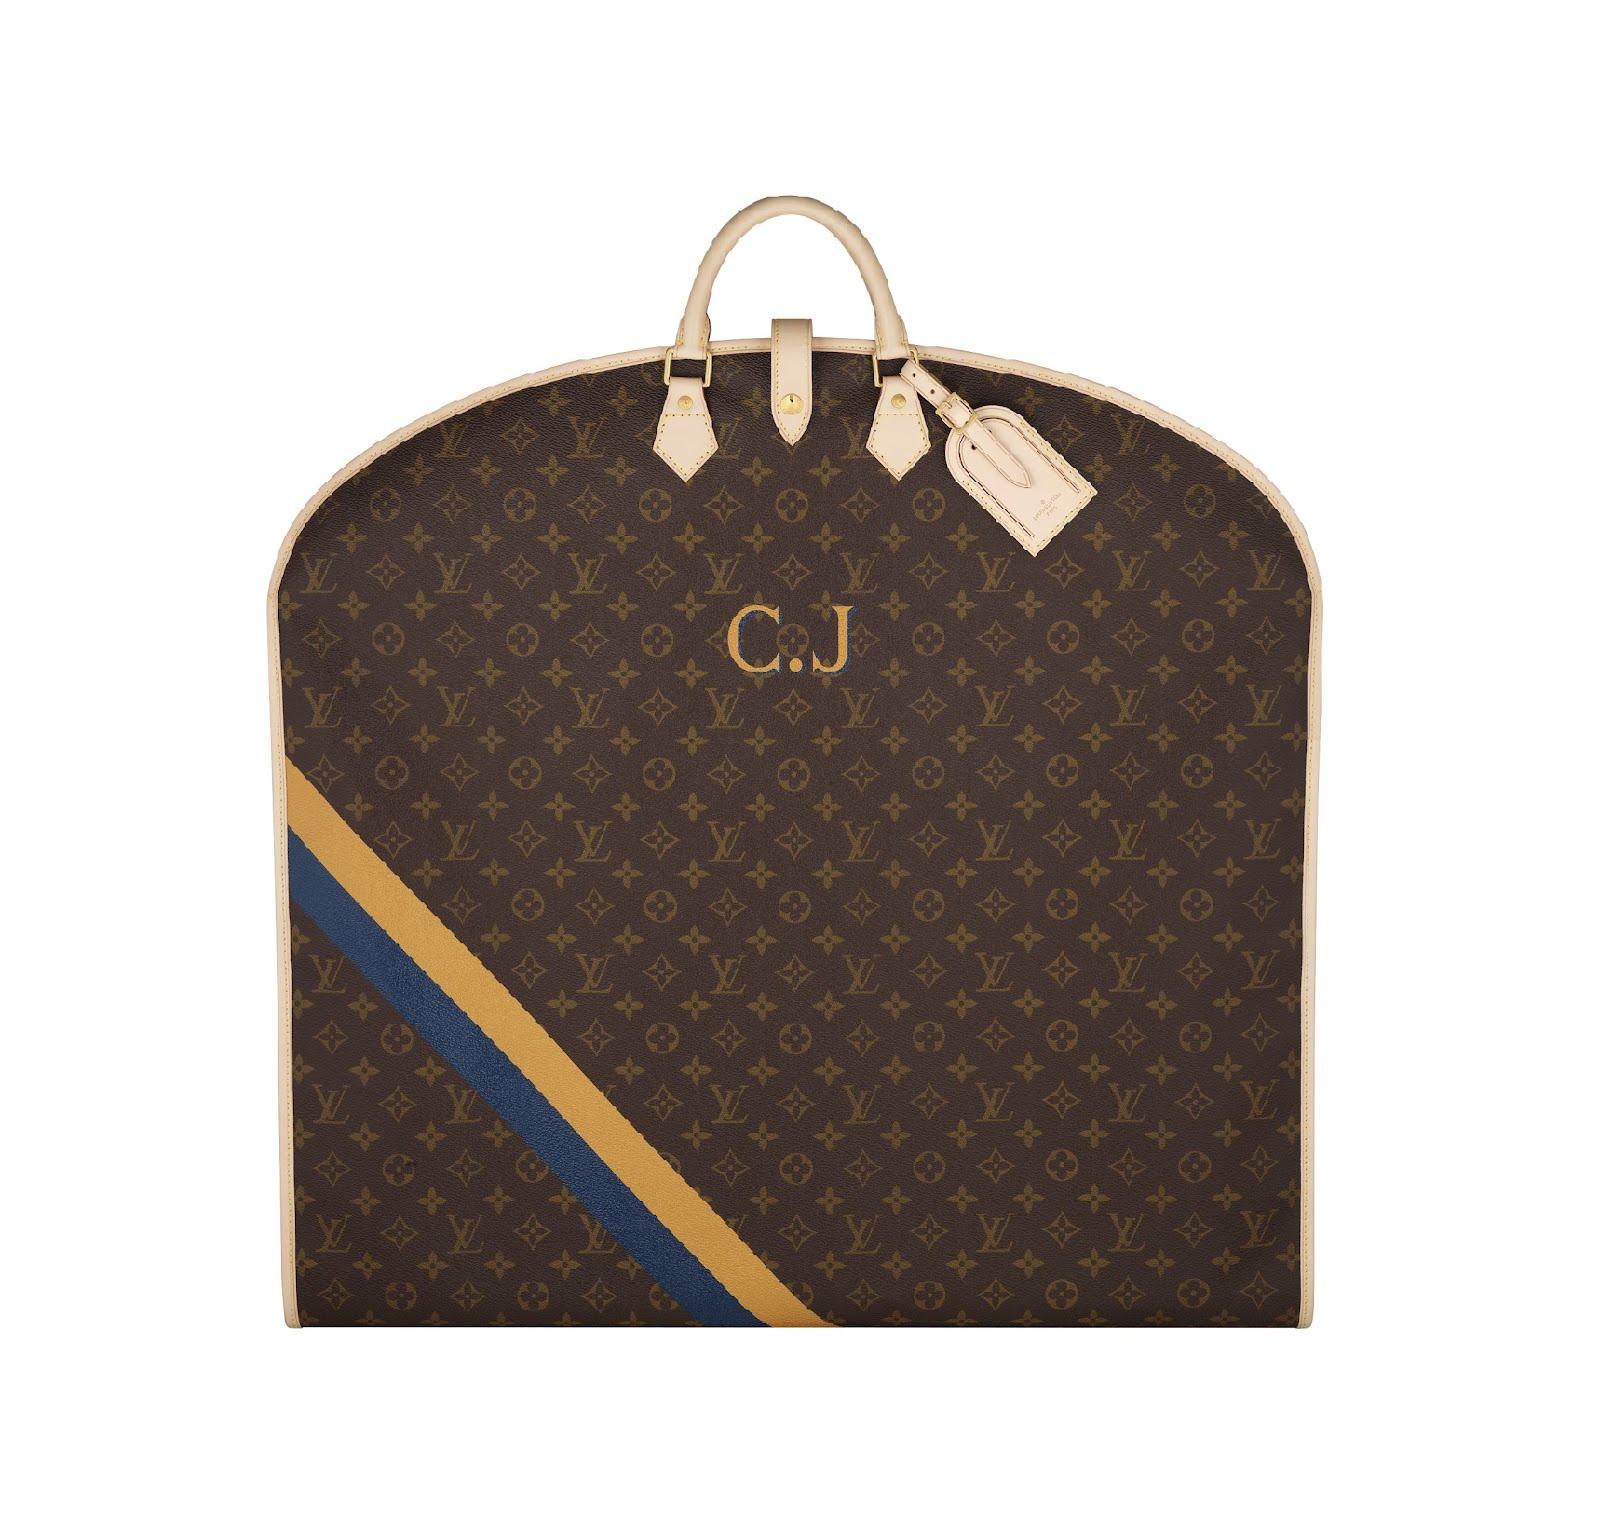 Servicio Mon Monogram de Louis Vuitton en portatrajes